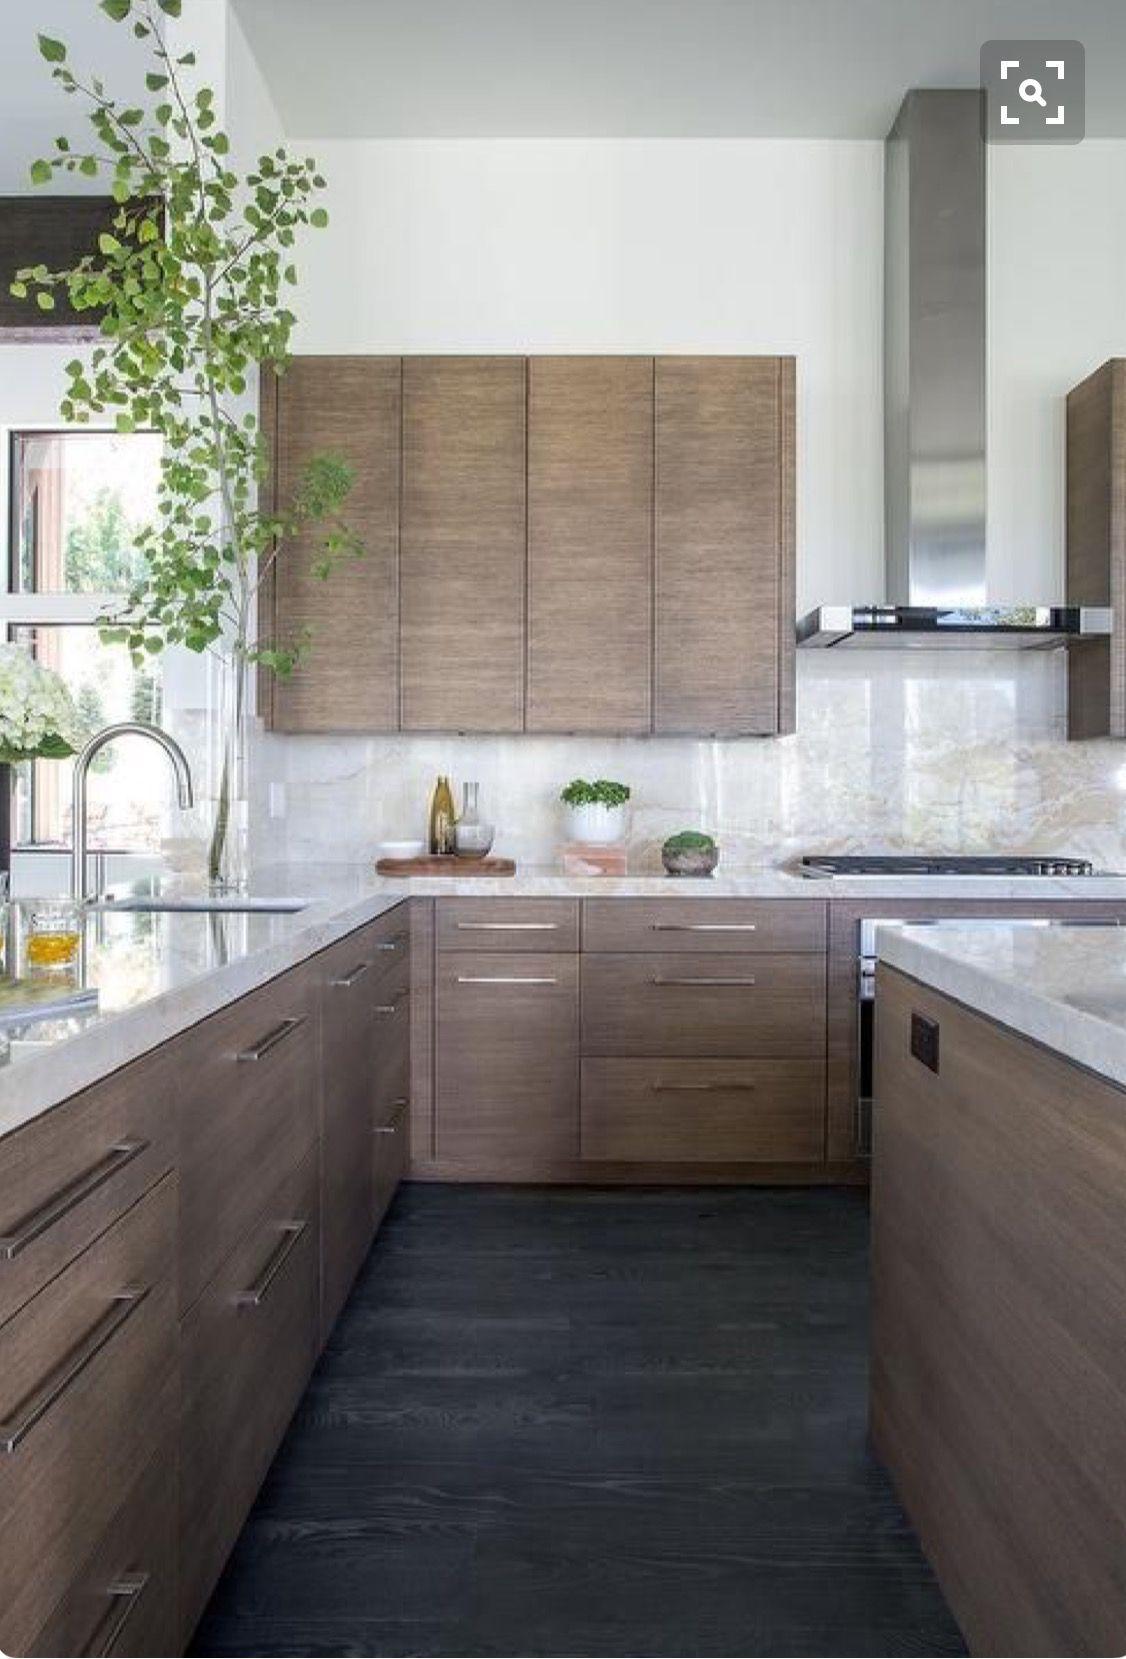 Pin By Sava Kostadinovic On Kitchen Walnut Kitchen Cabinets Modern Kitchen Cabinets Kitchen Design